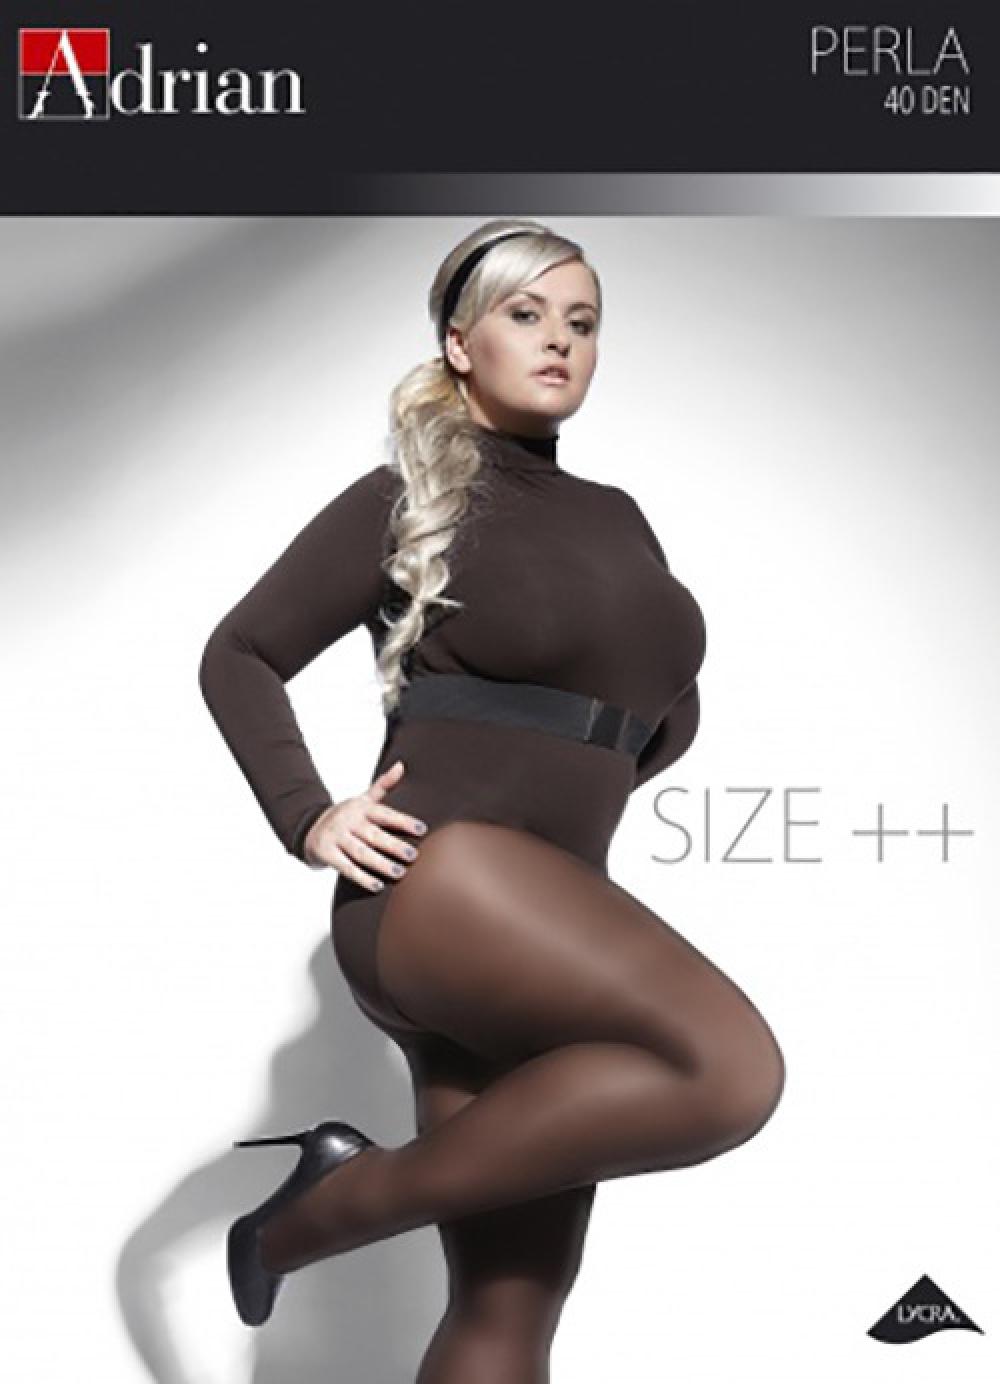 Plus Size Tights Adrian Perla Semi Opaque, 40 Denier Sizes